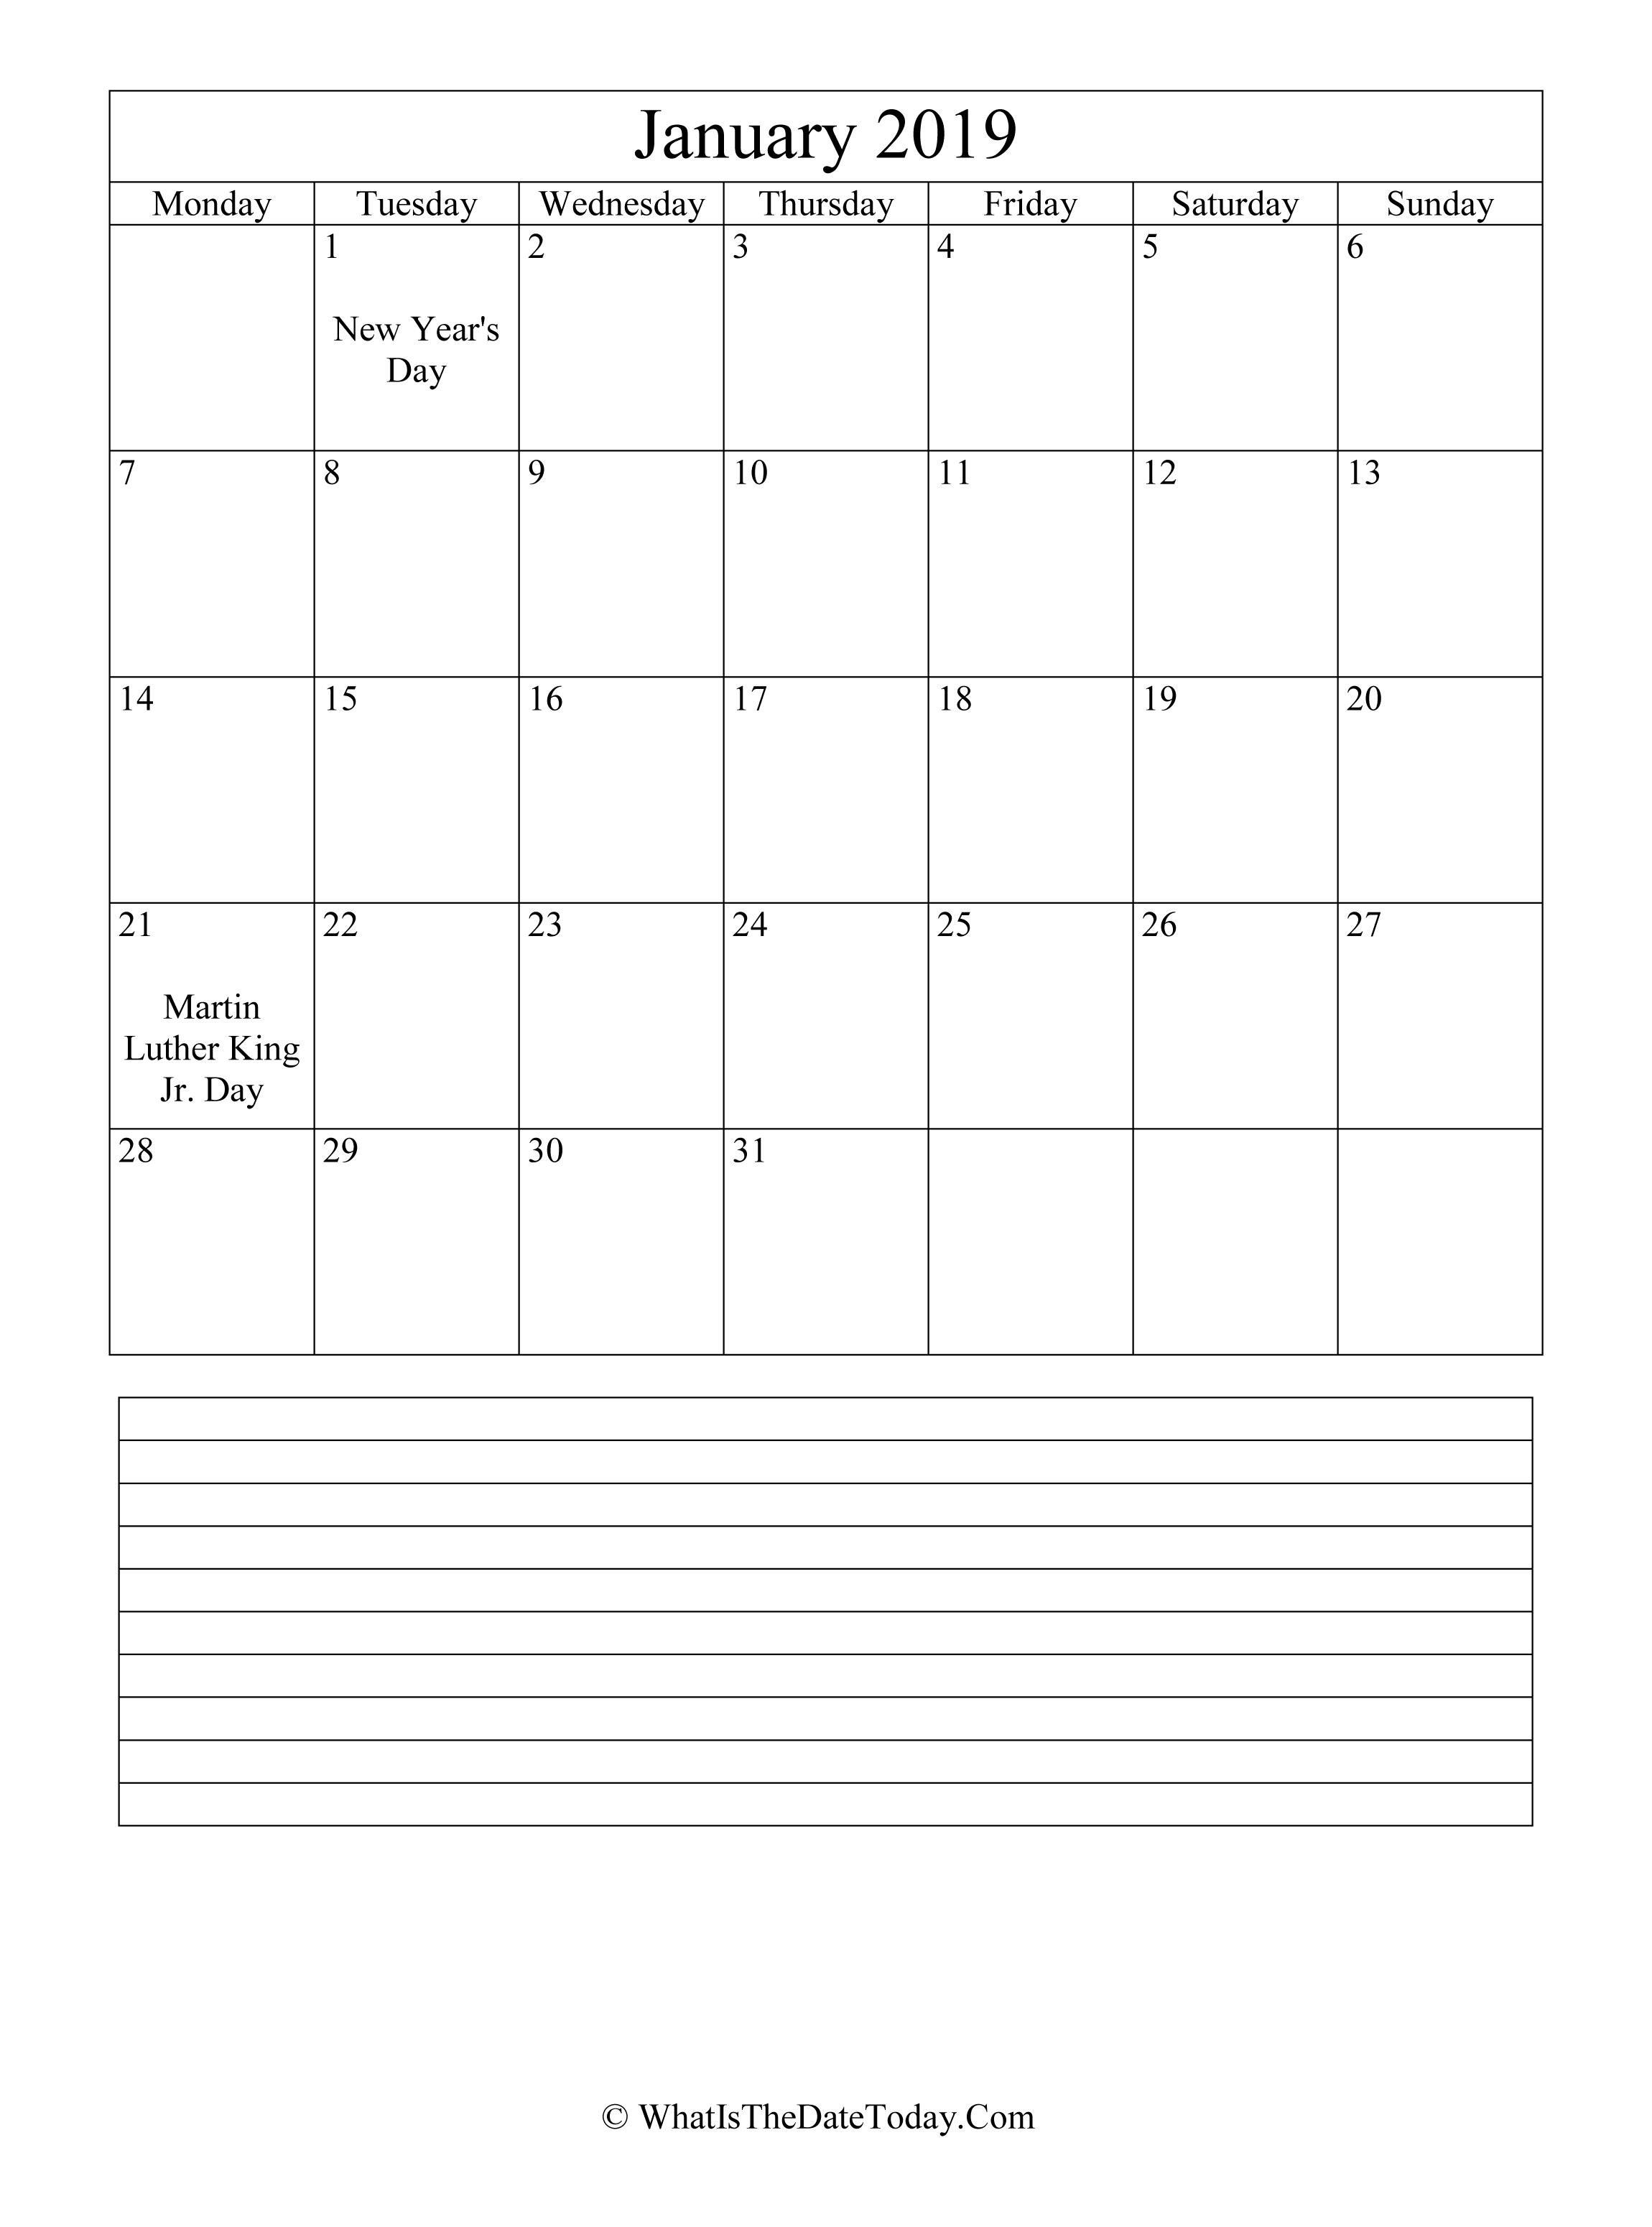 January 2019 Calendar Mlk Day January 2019 Calendar Editable with Notes Space (vertical layout)